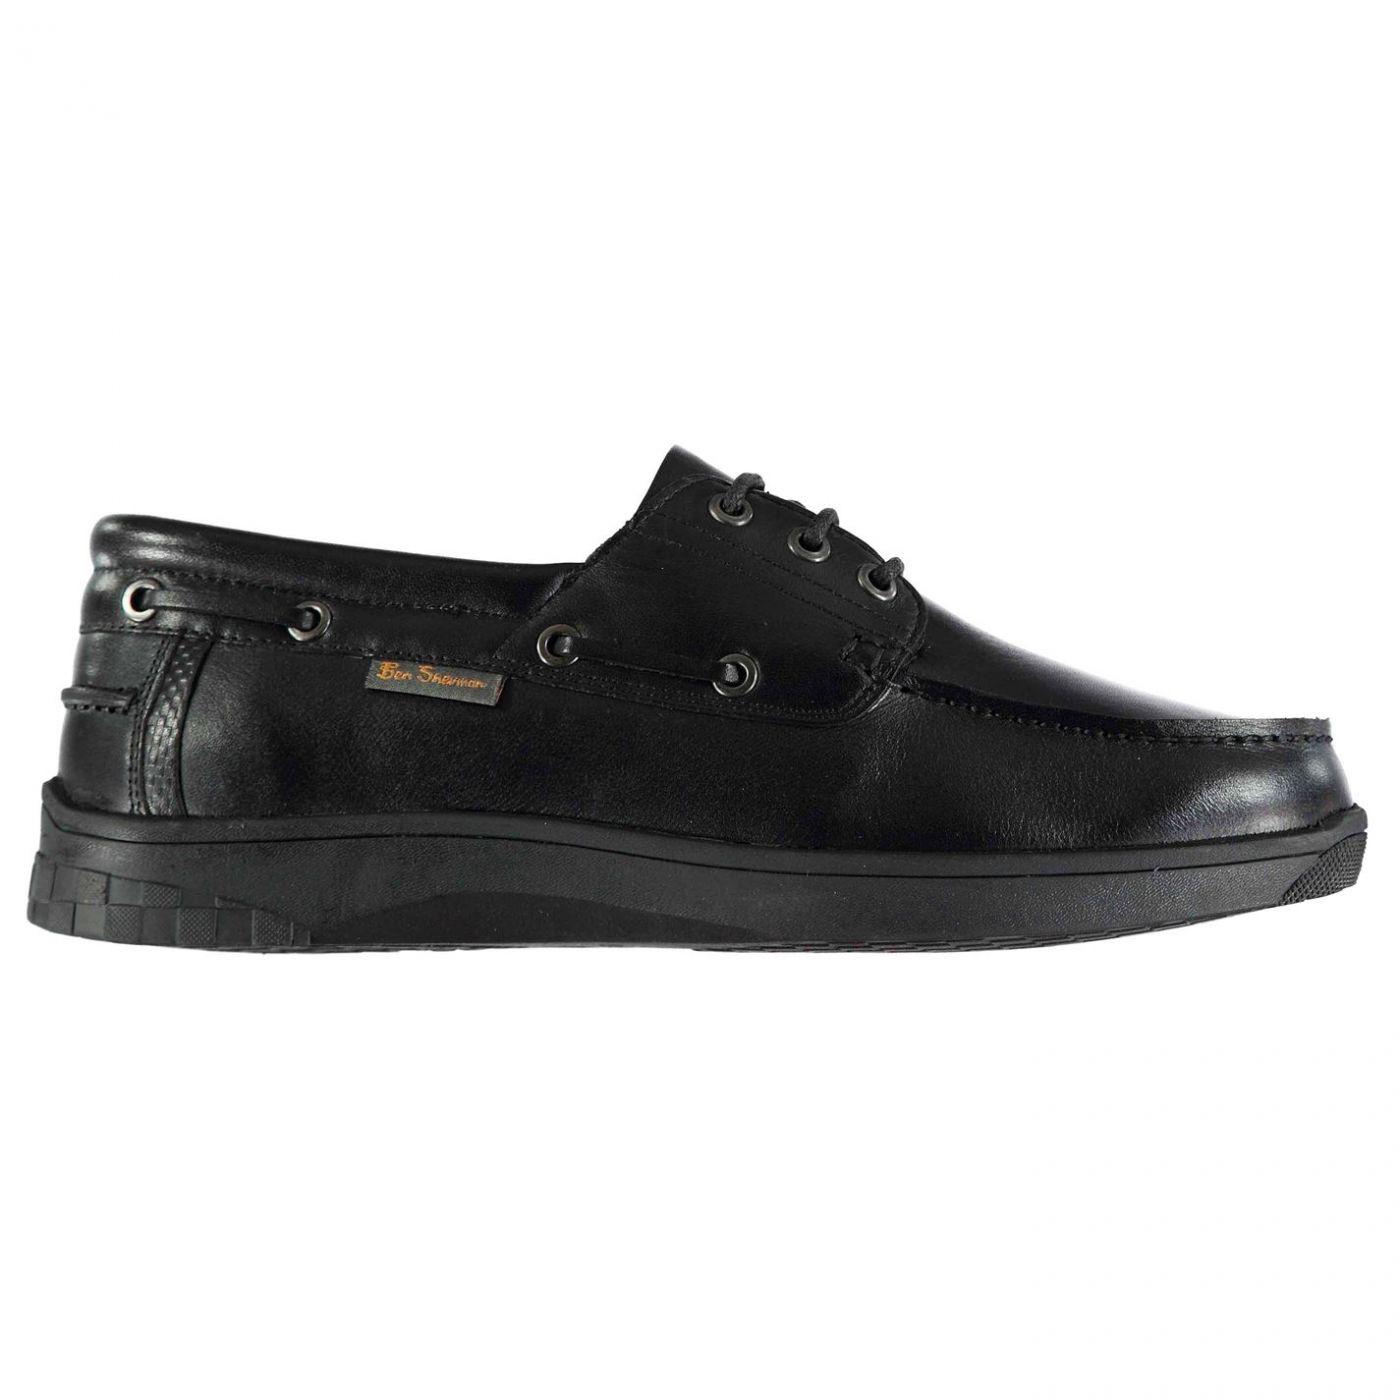 Ben Sherman Forge Shoes